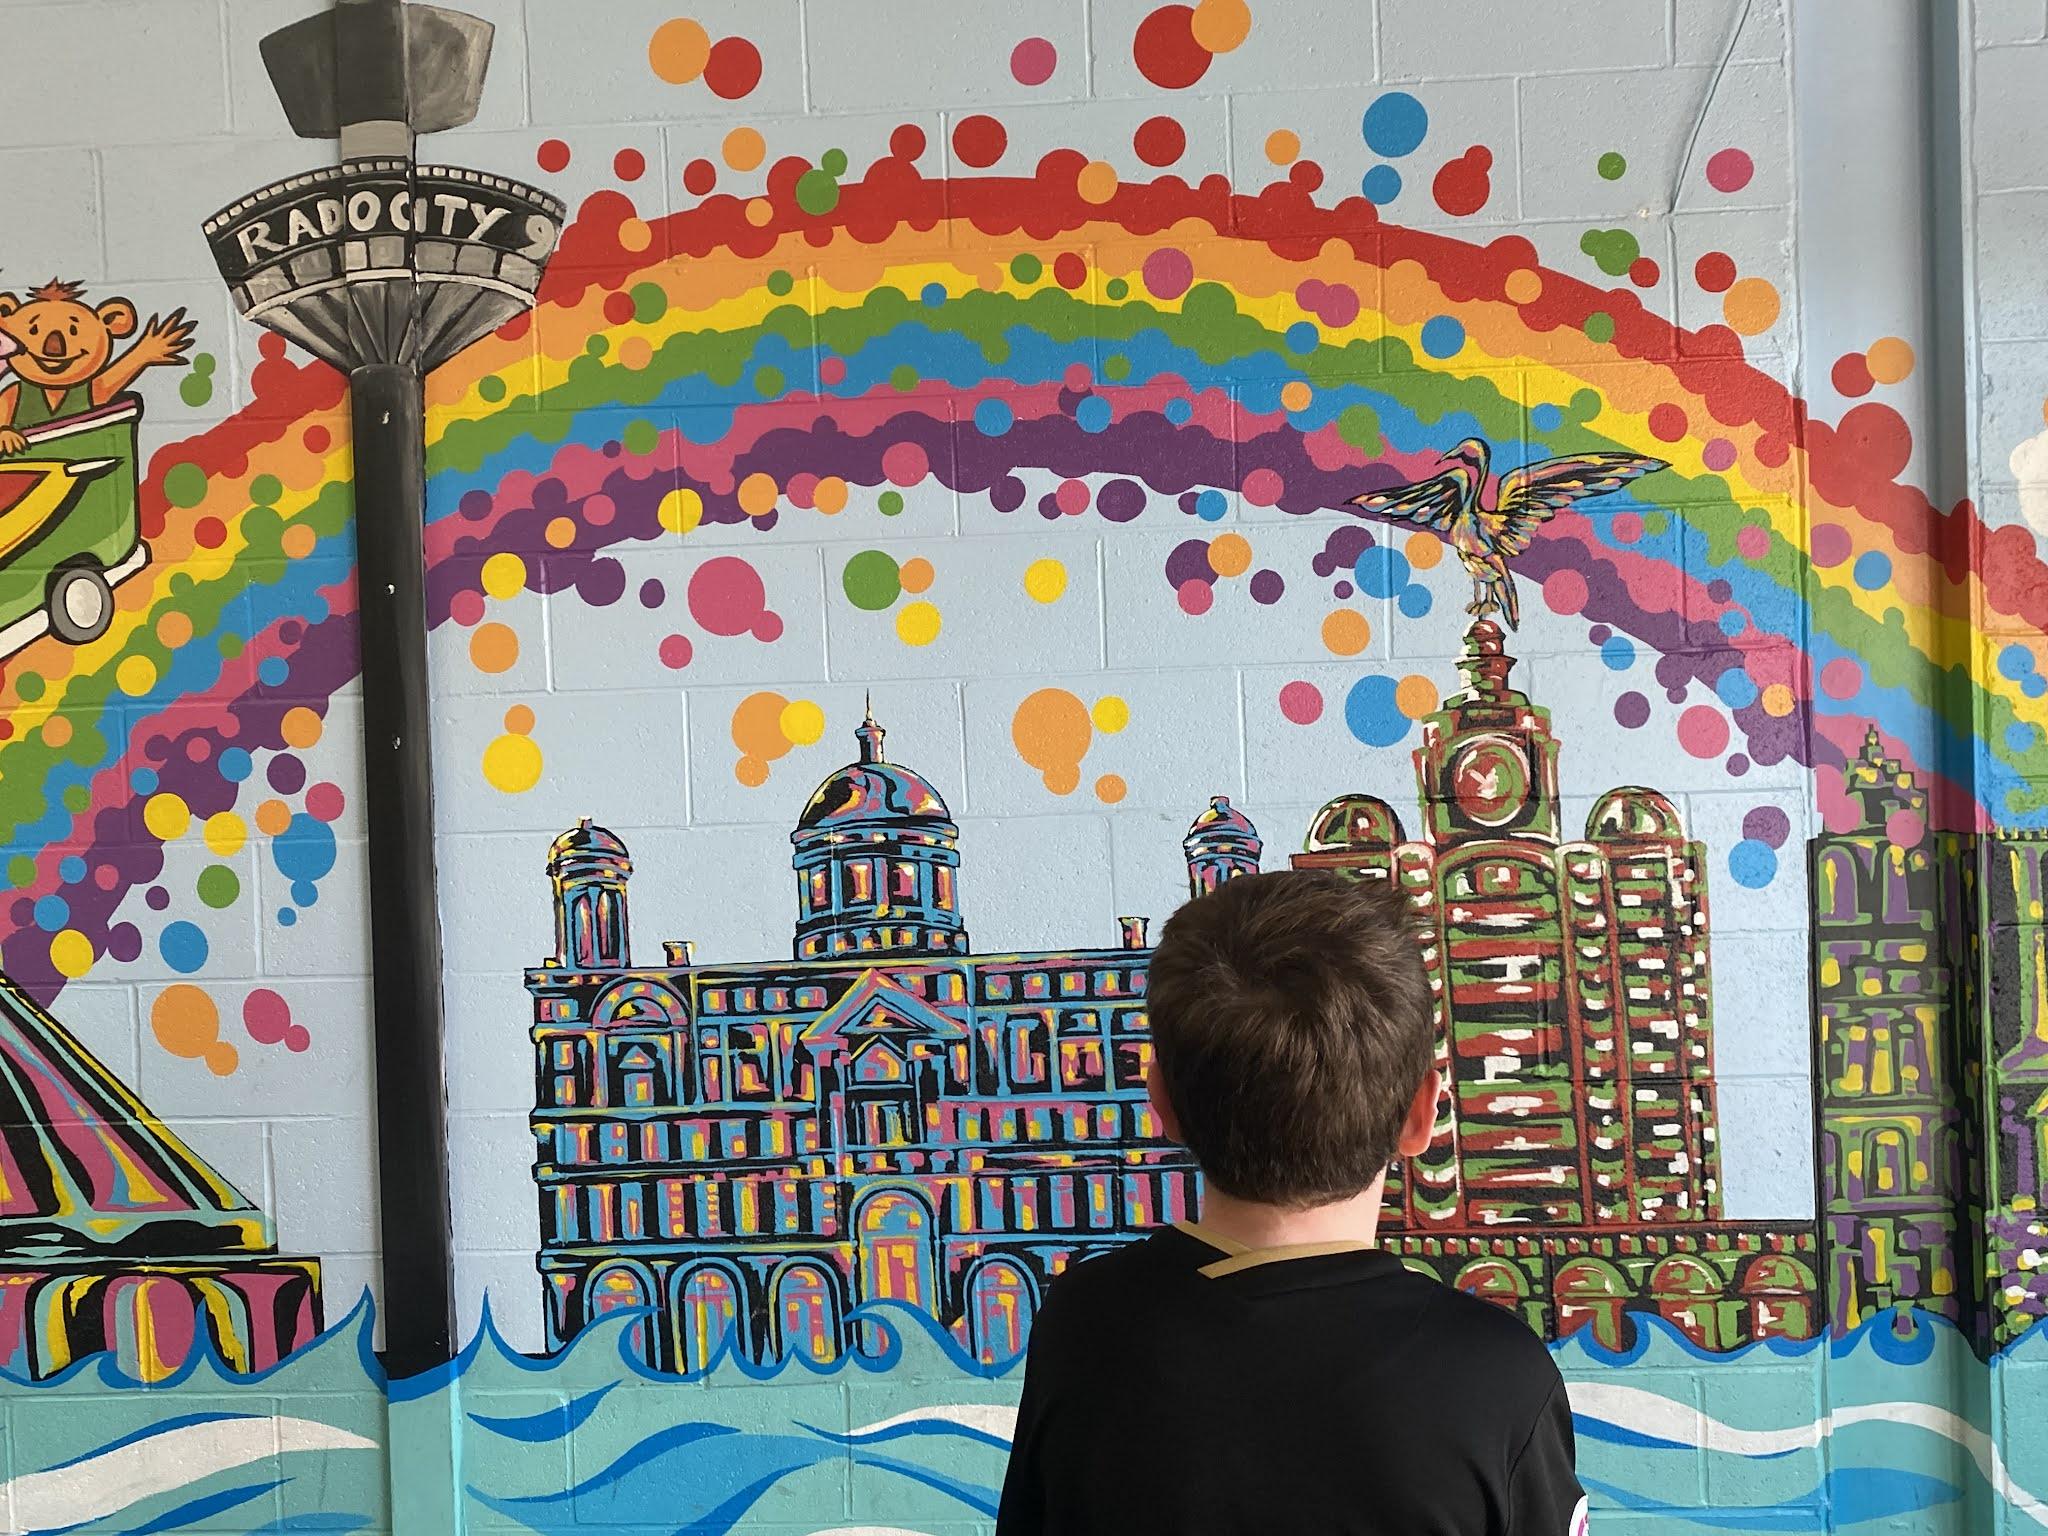 Boy looking at a wall mural